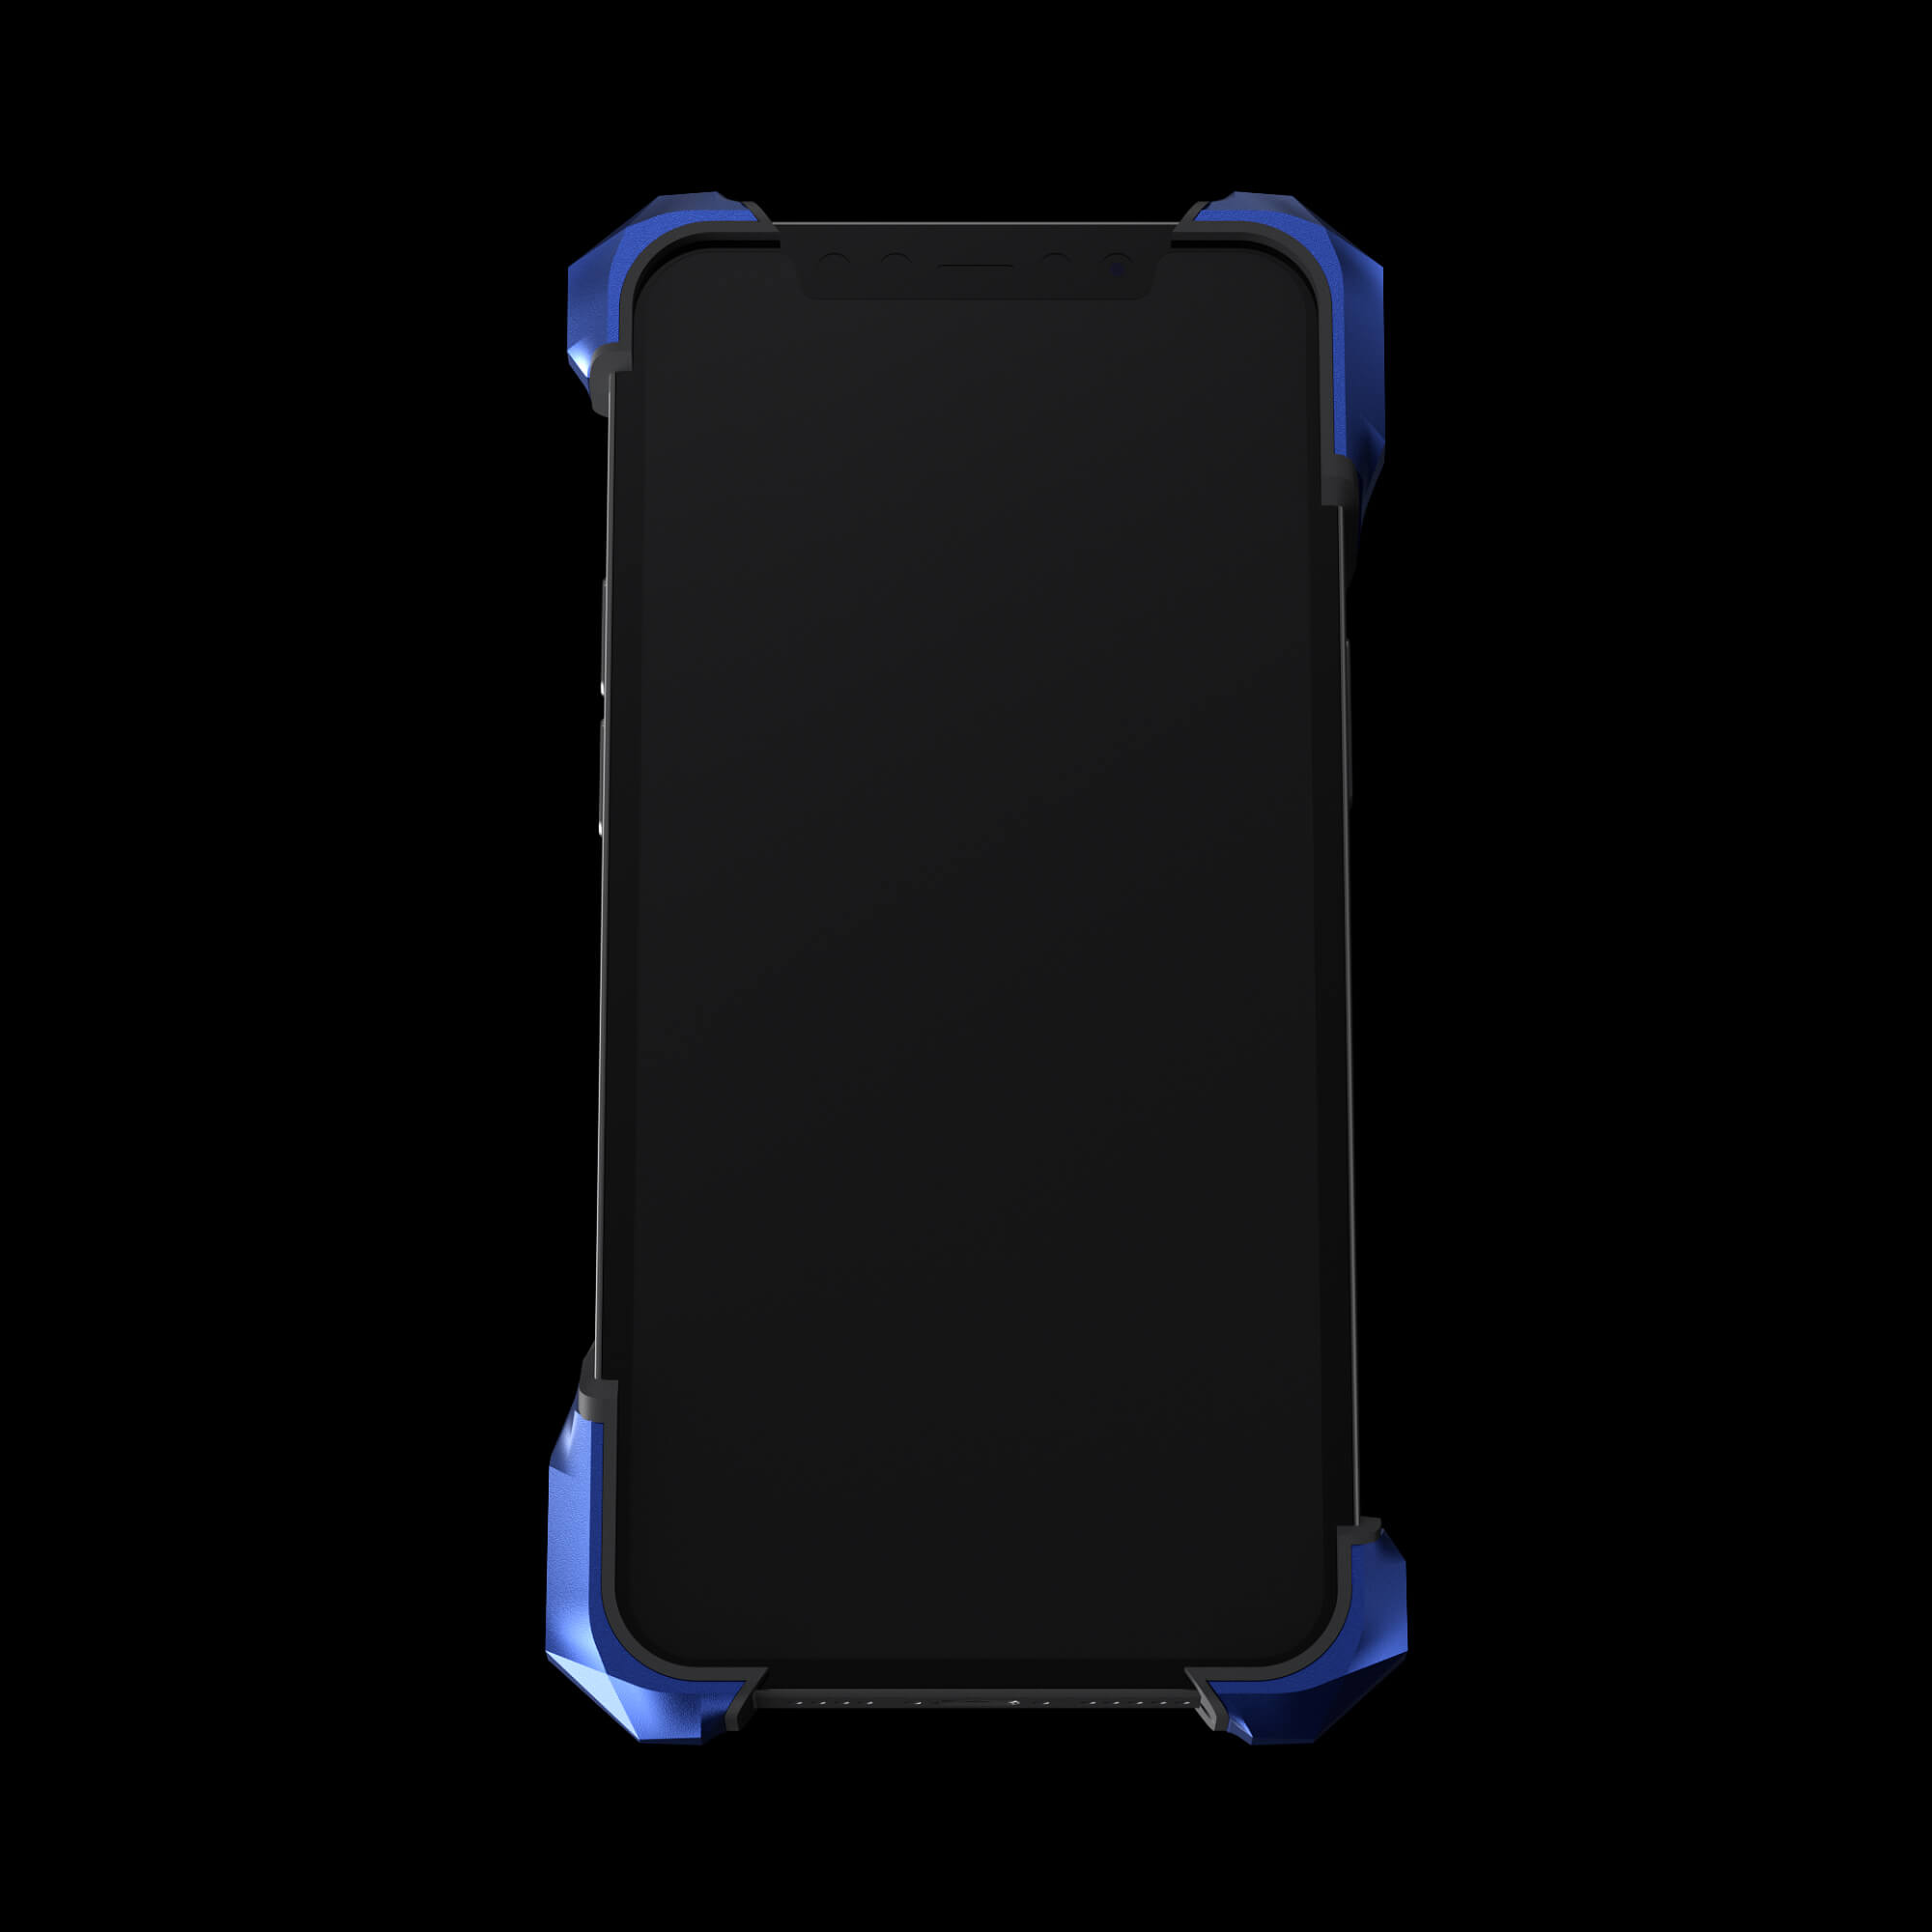 Blue and Black Cyberwatch Case on Apple Watch